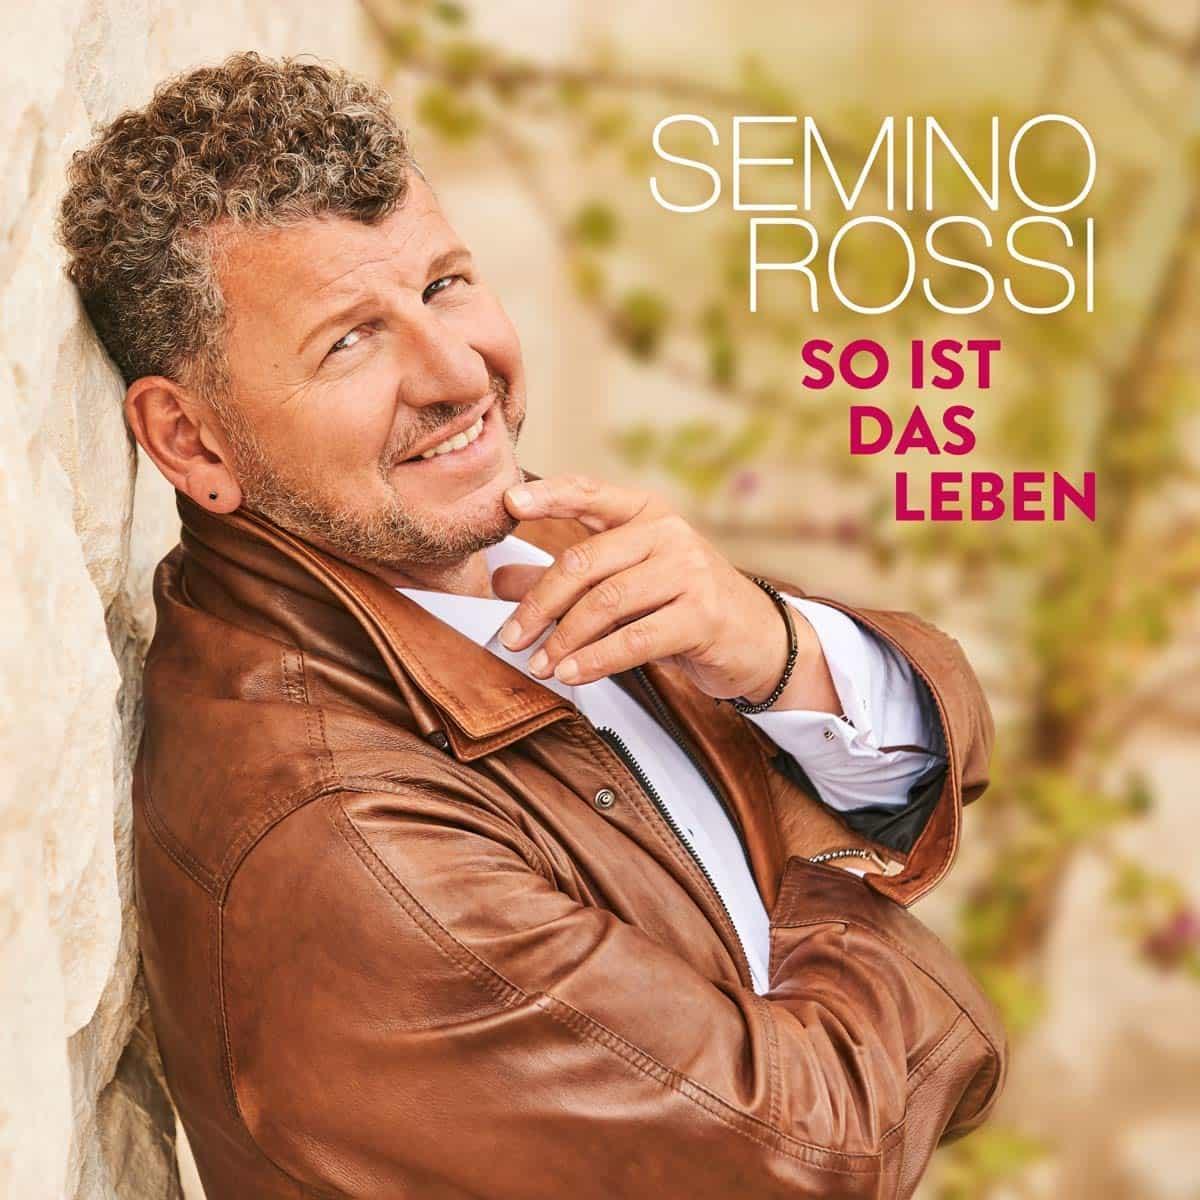 Semino Rossi CD So ist das Leben 2019